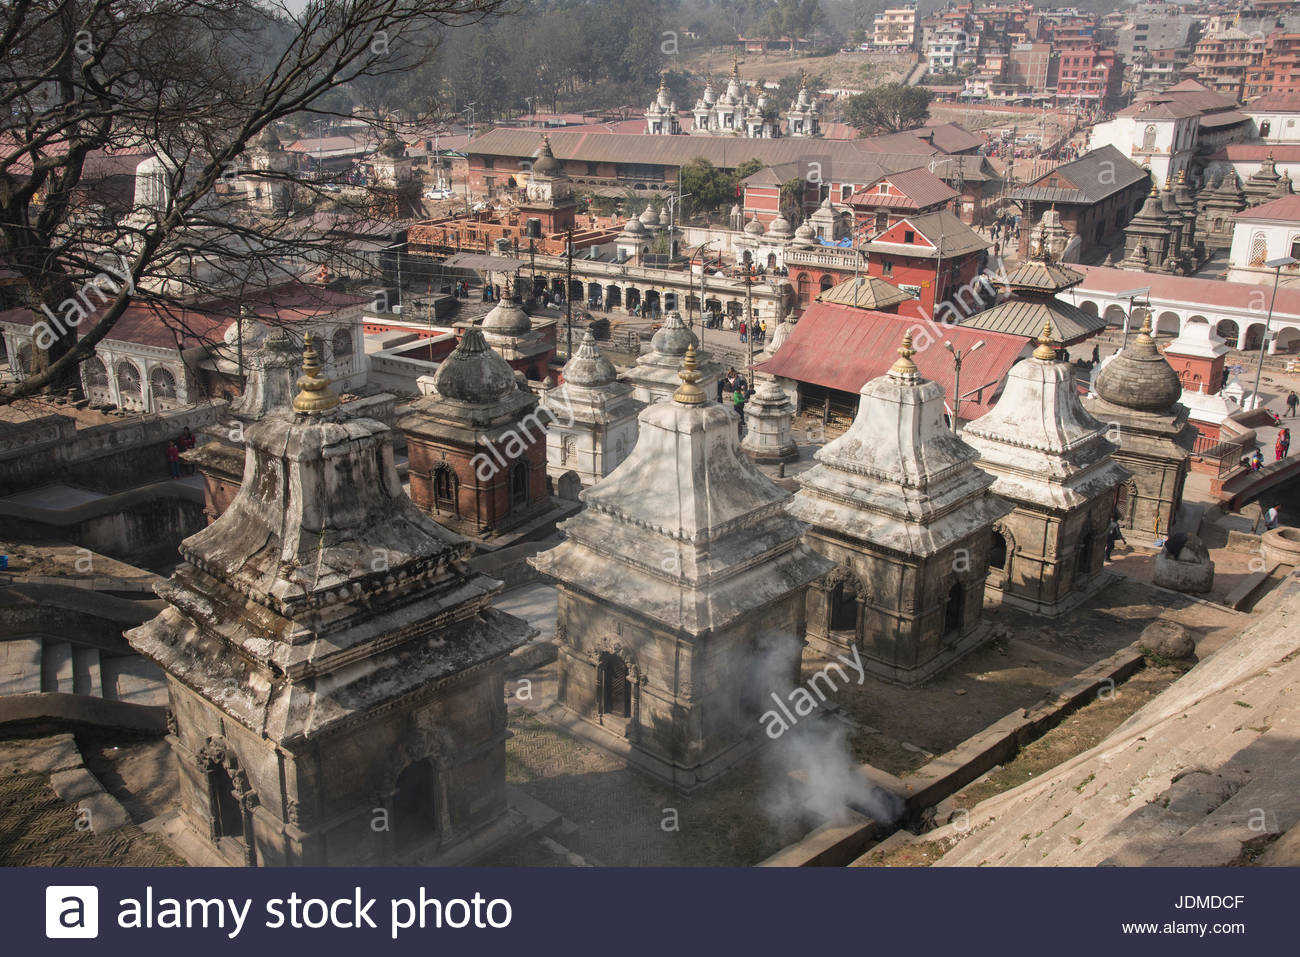 The Pashupatinath Temple in Kathmandu. - Stock Image